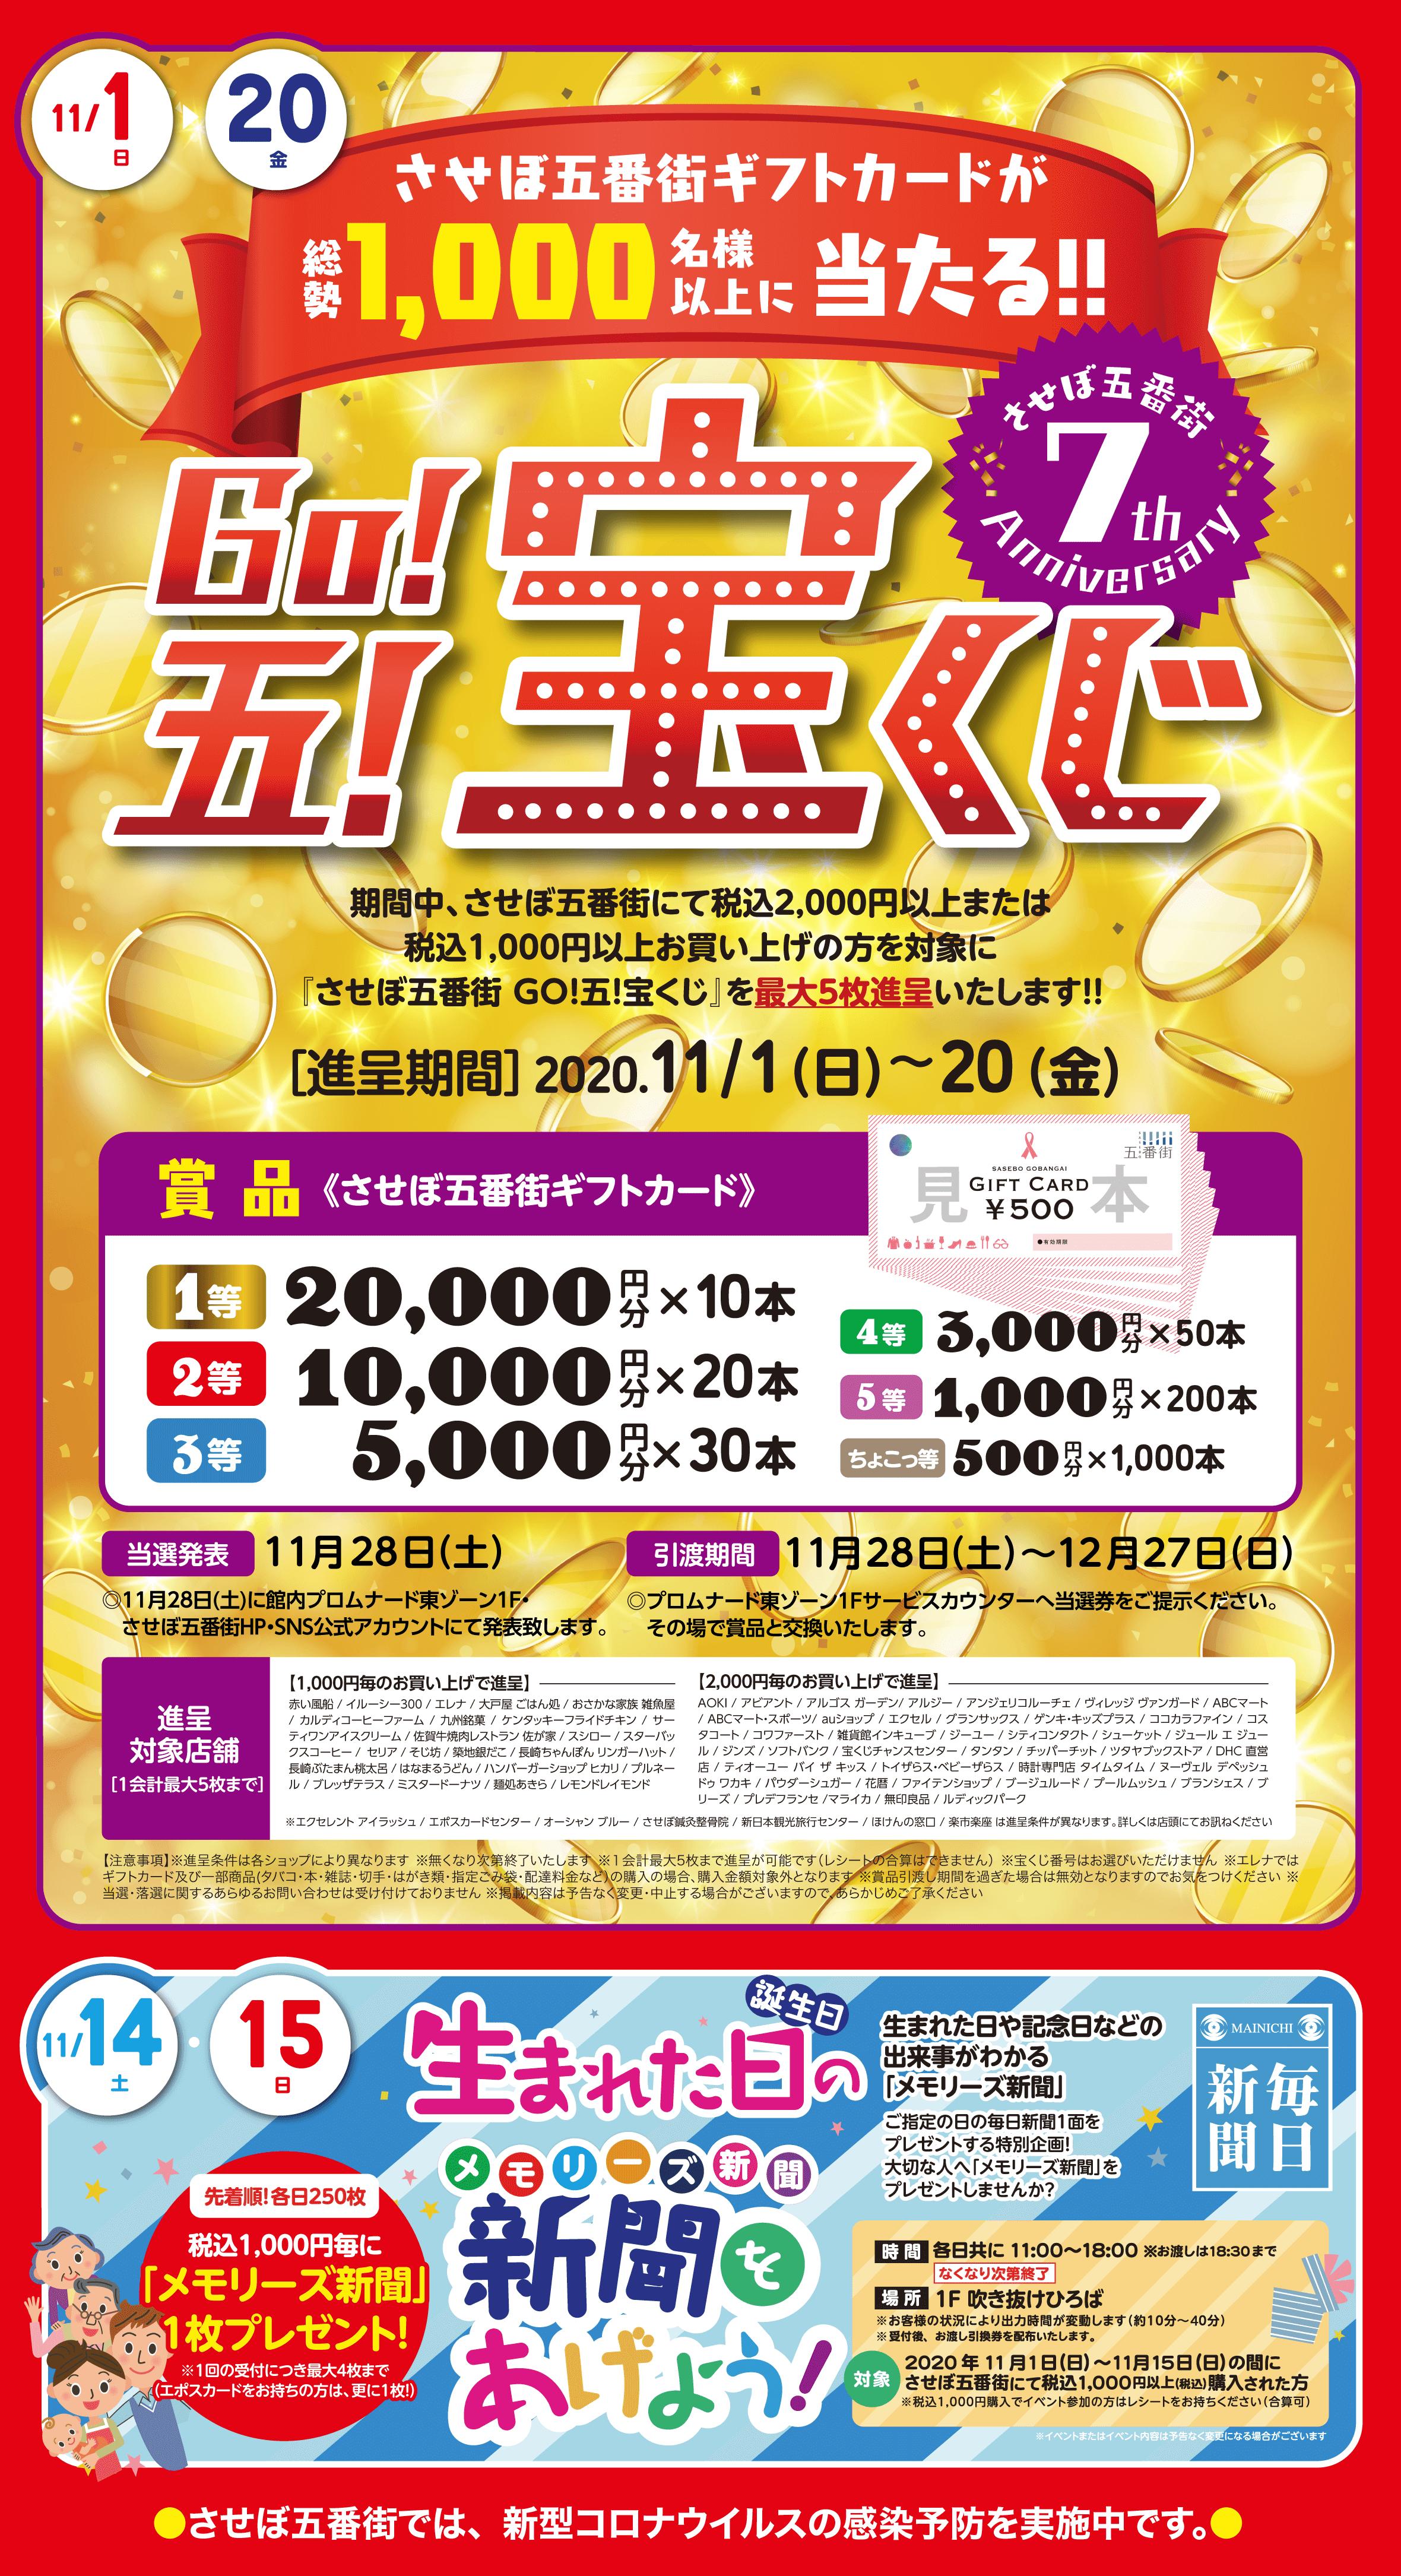 7th ANNIVERSARY SALE 11/1(日)-20(金)